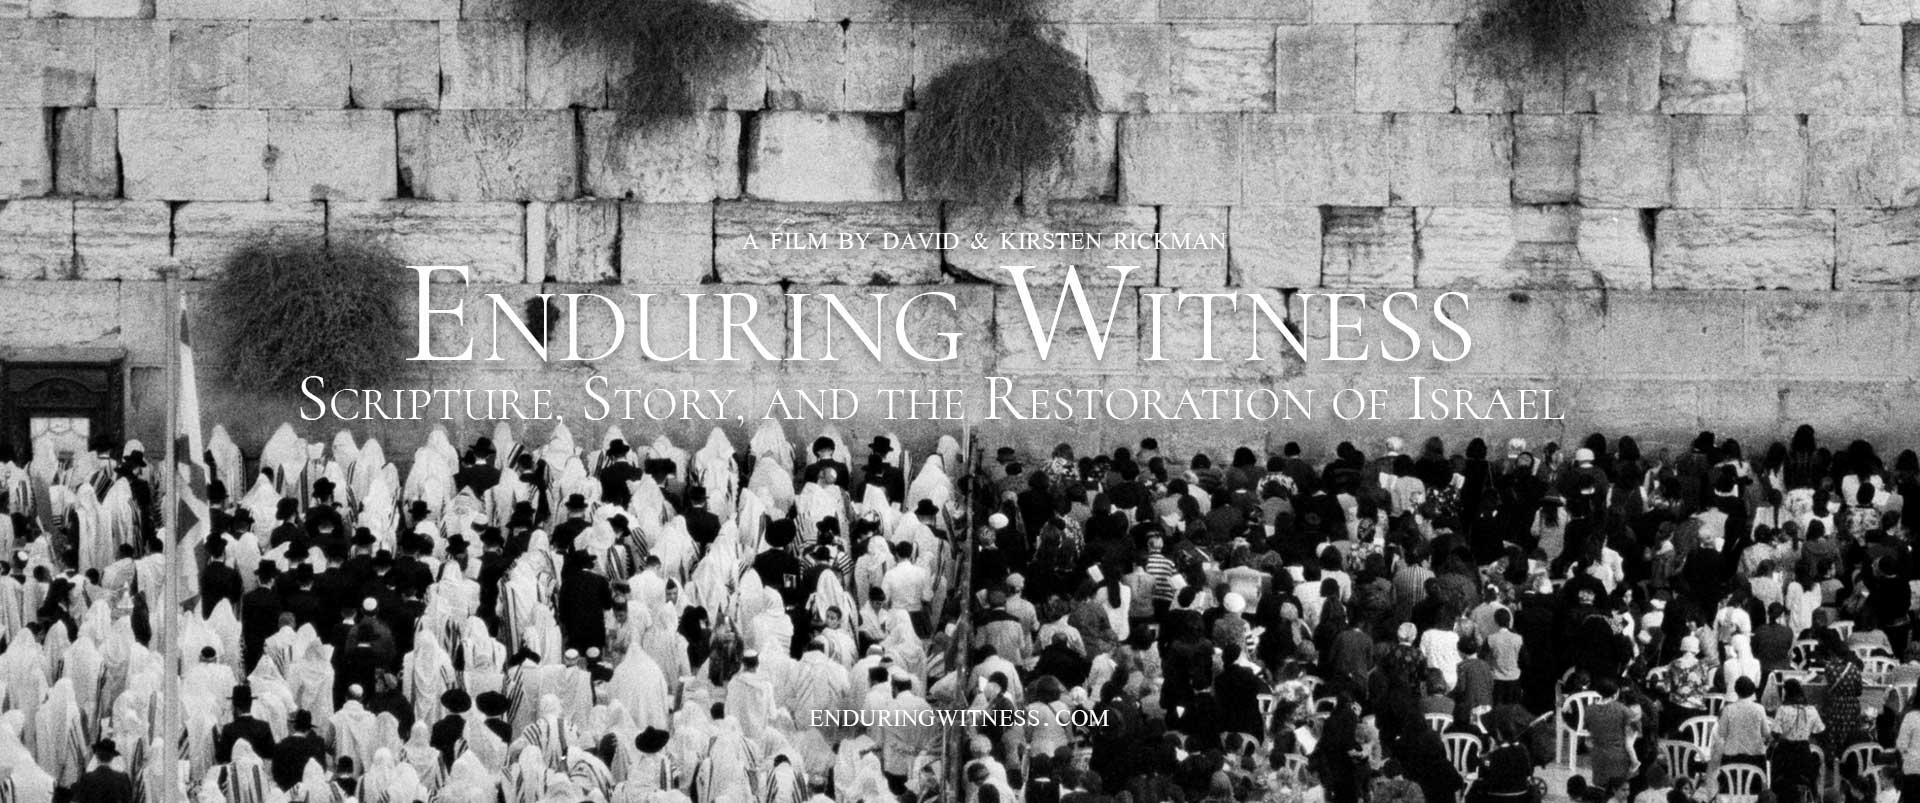 Enduring Witness